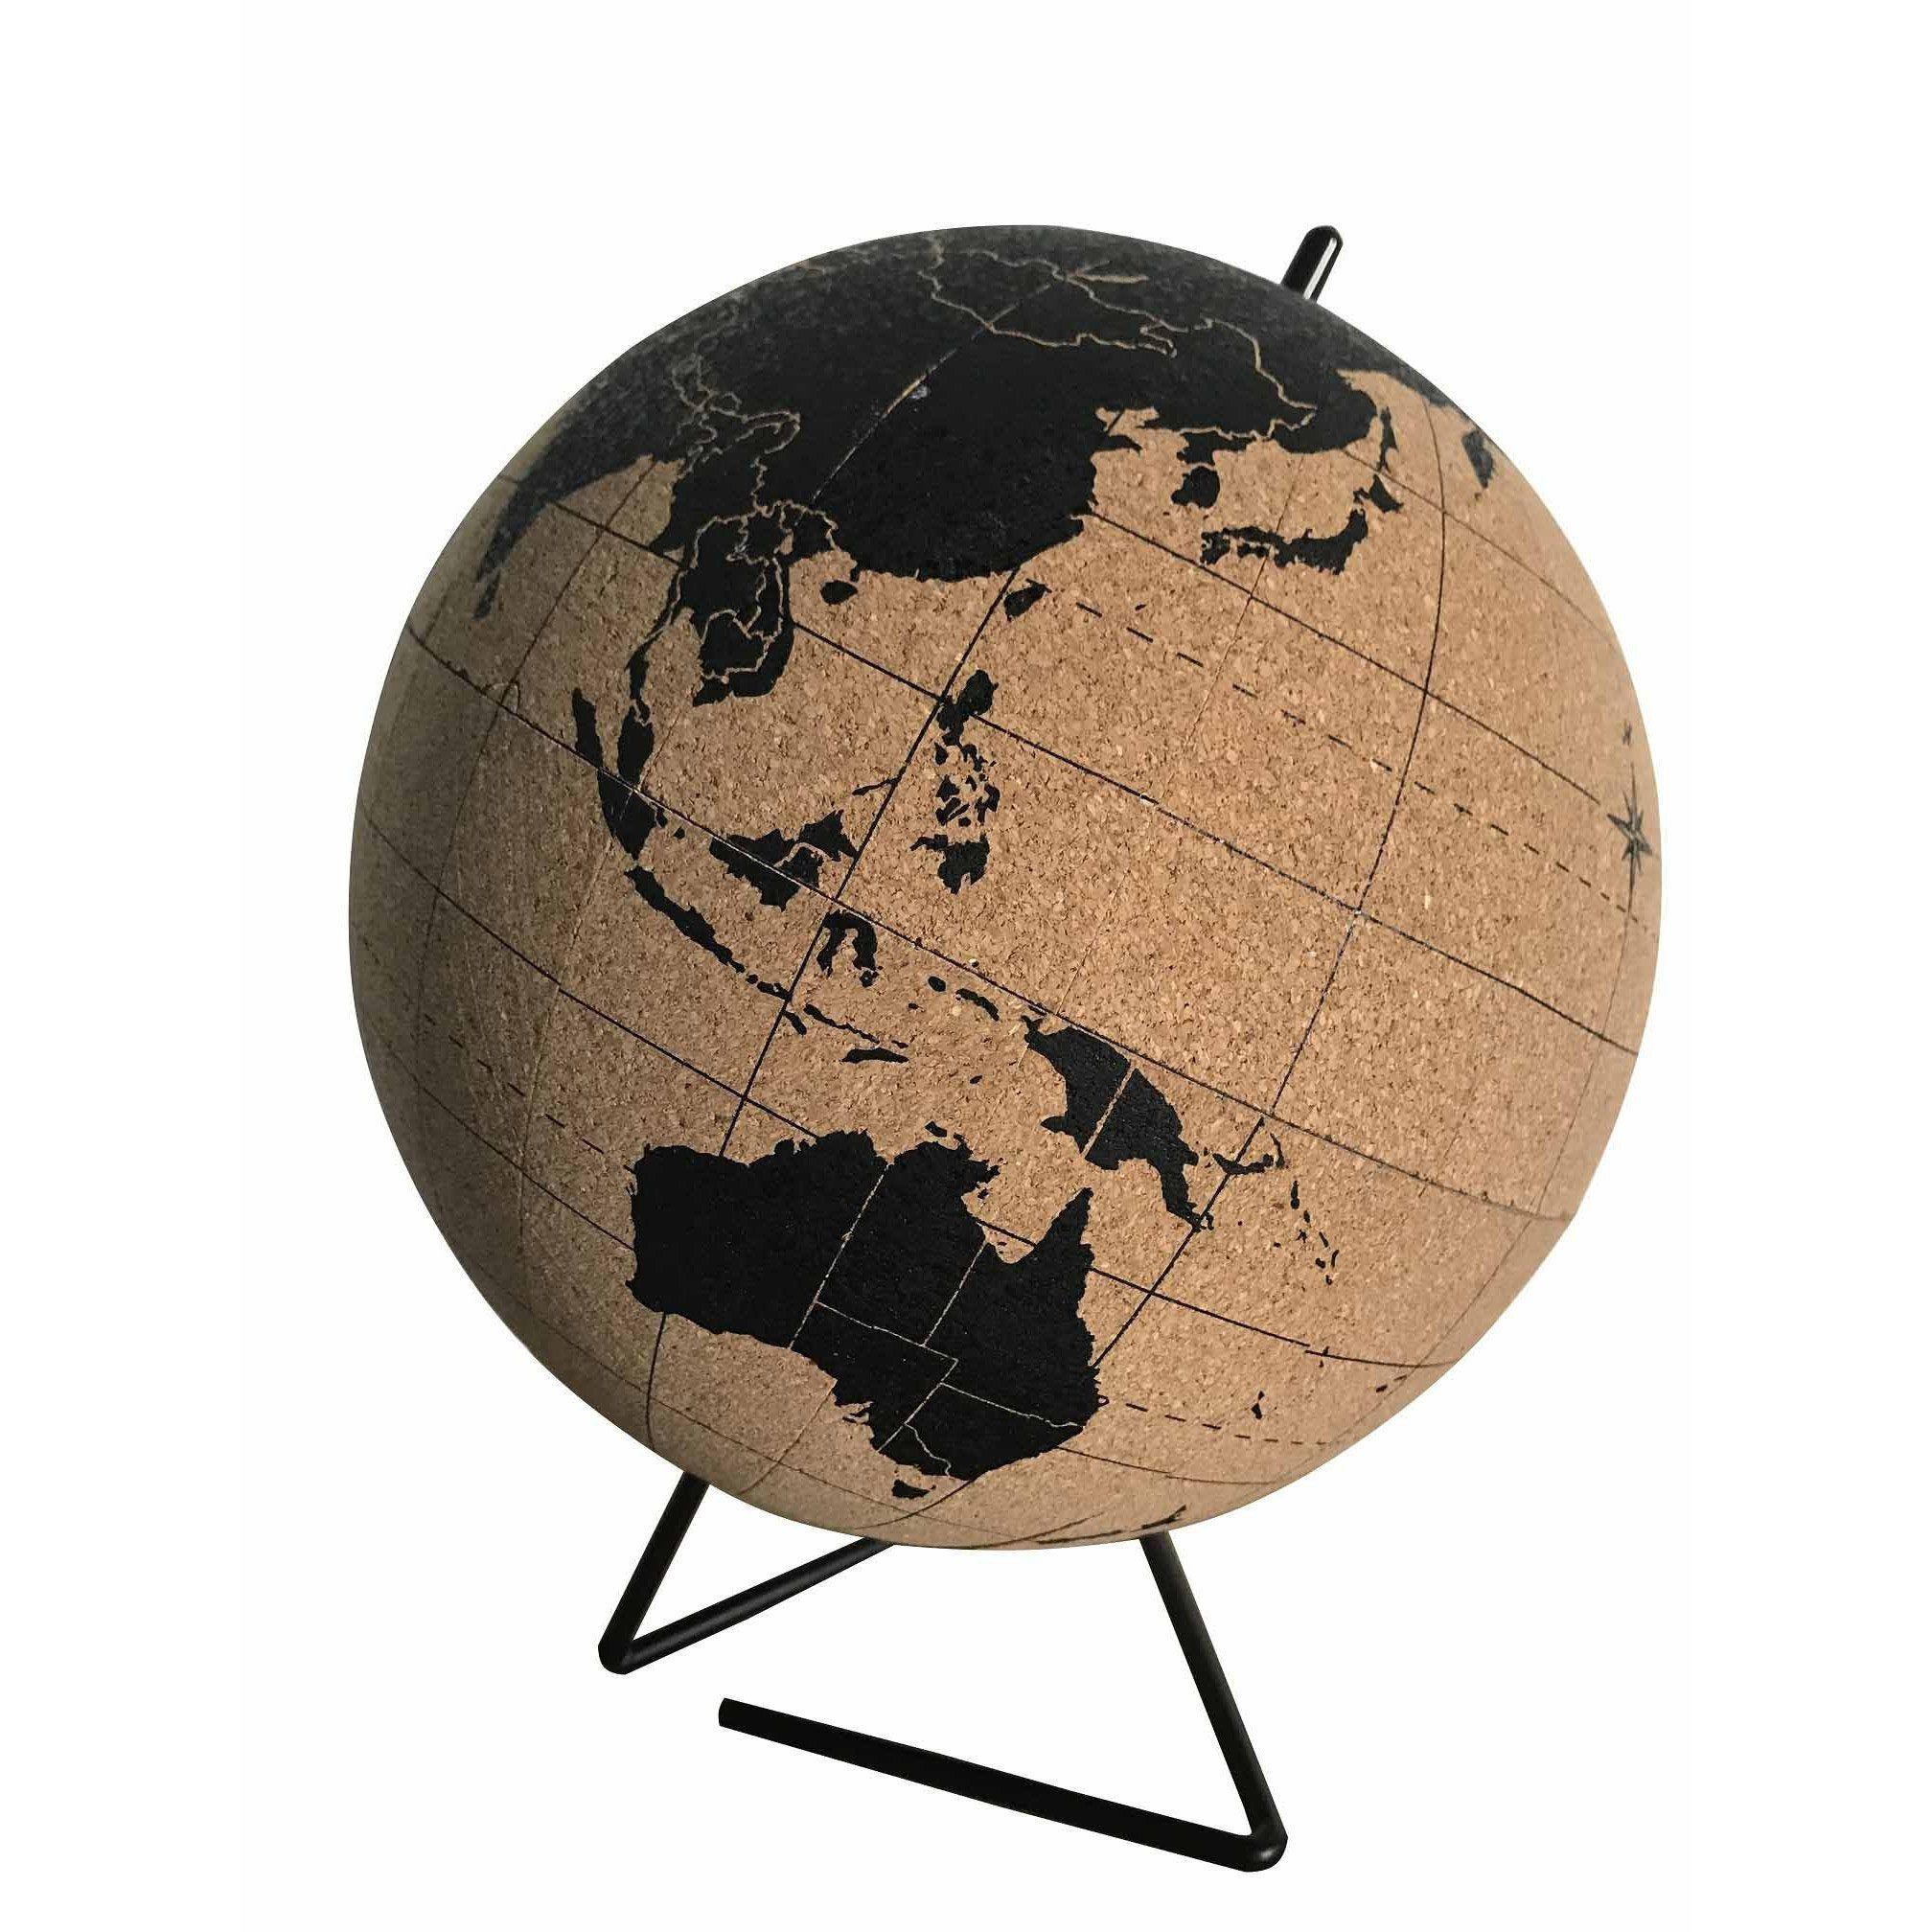 prix carte leroy merlin Globe terrestre liège Impression carte du monde marron/noir, D.20